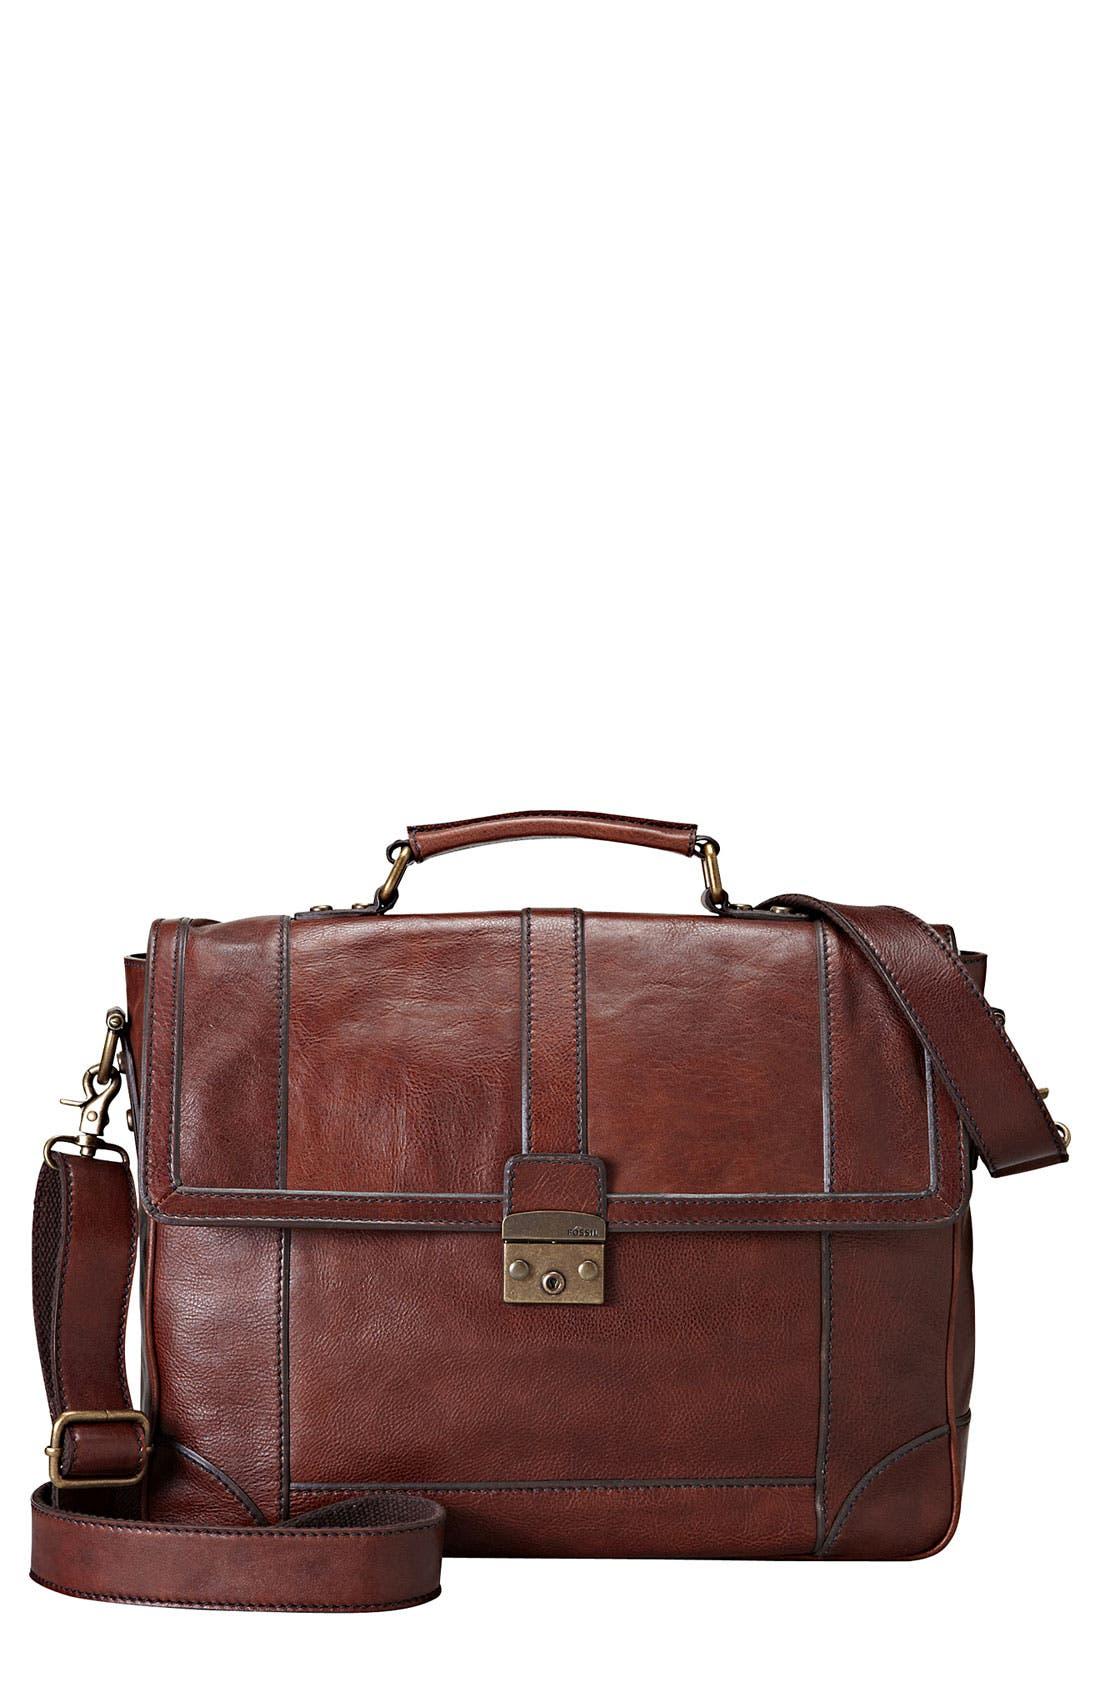 'Lineage' Messenger Bag, Main, color, 200